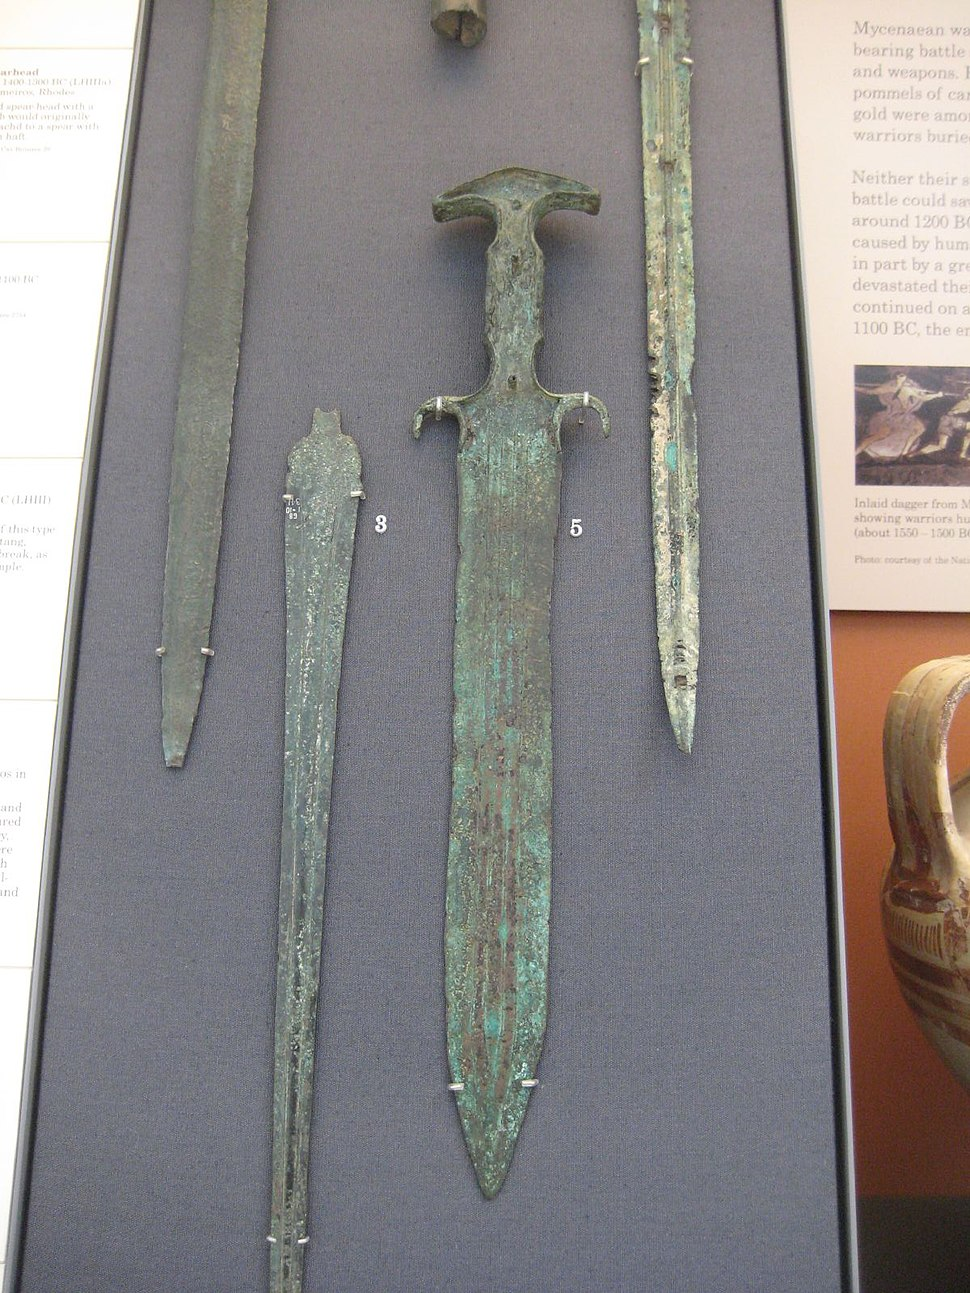 Mycenaean Bronze Dagger